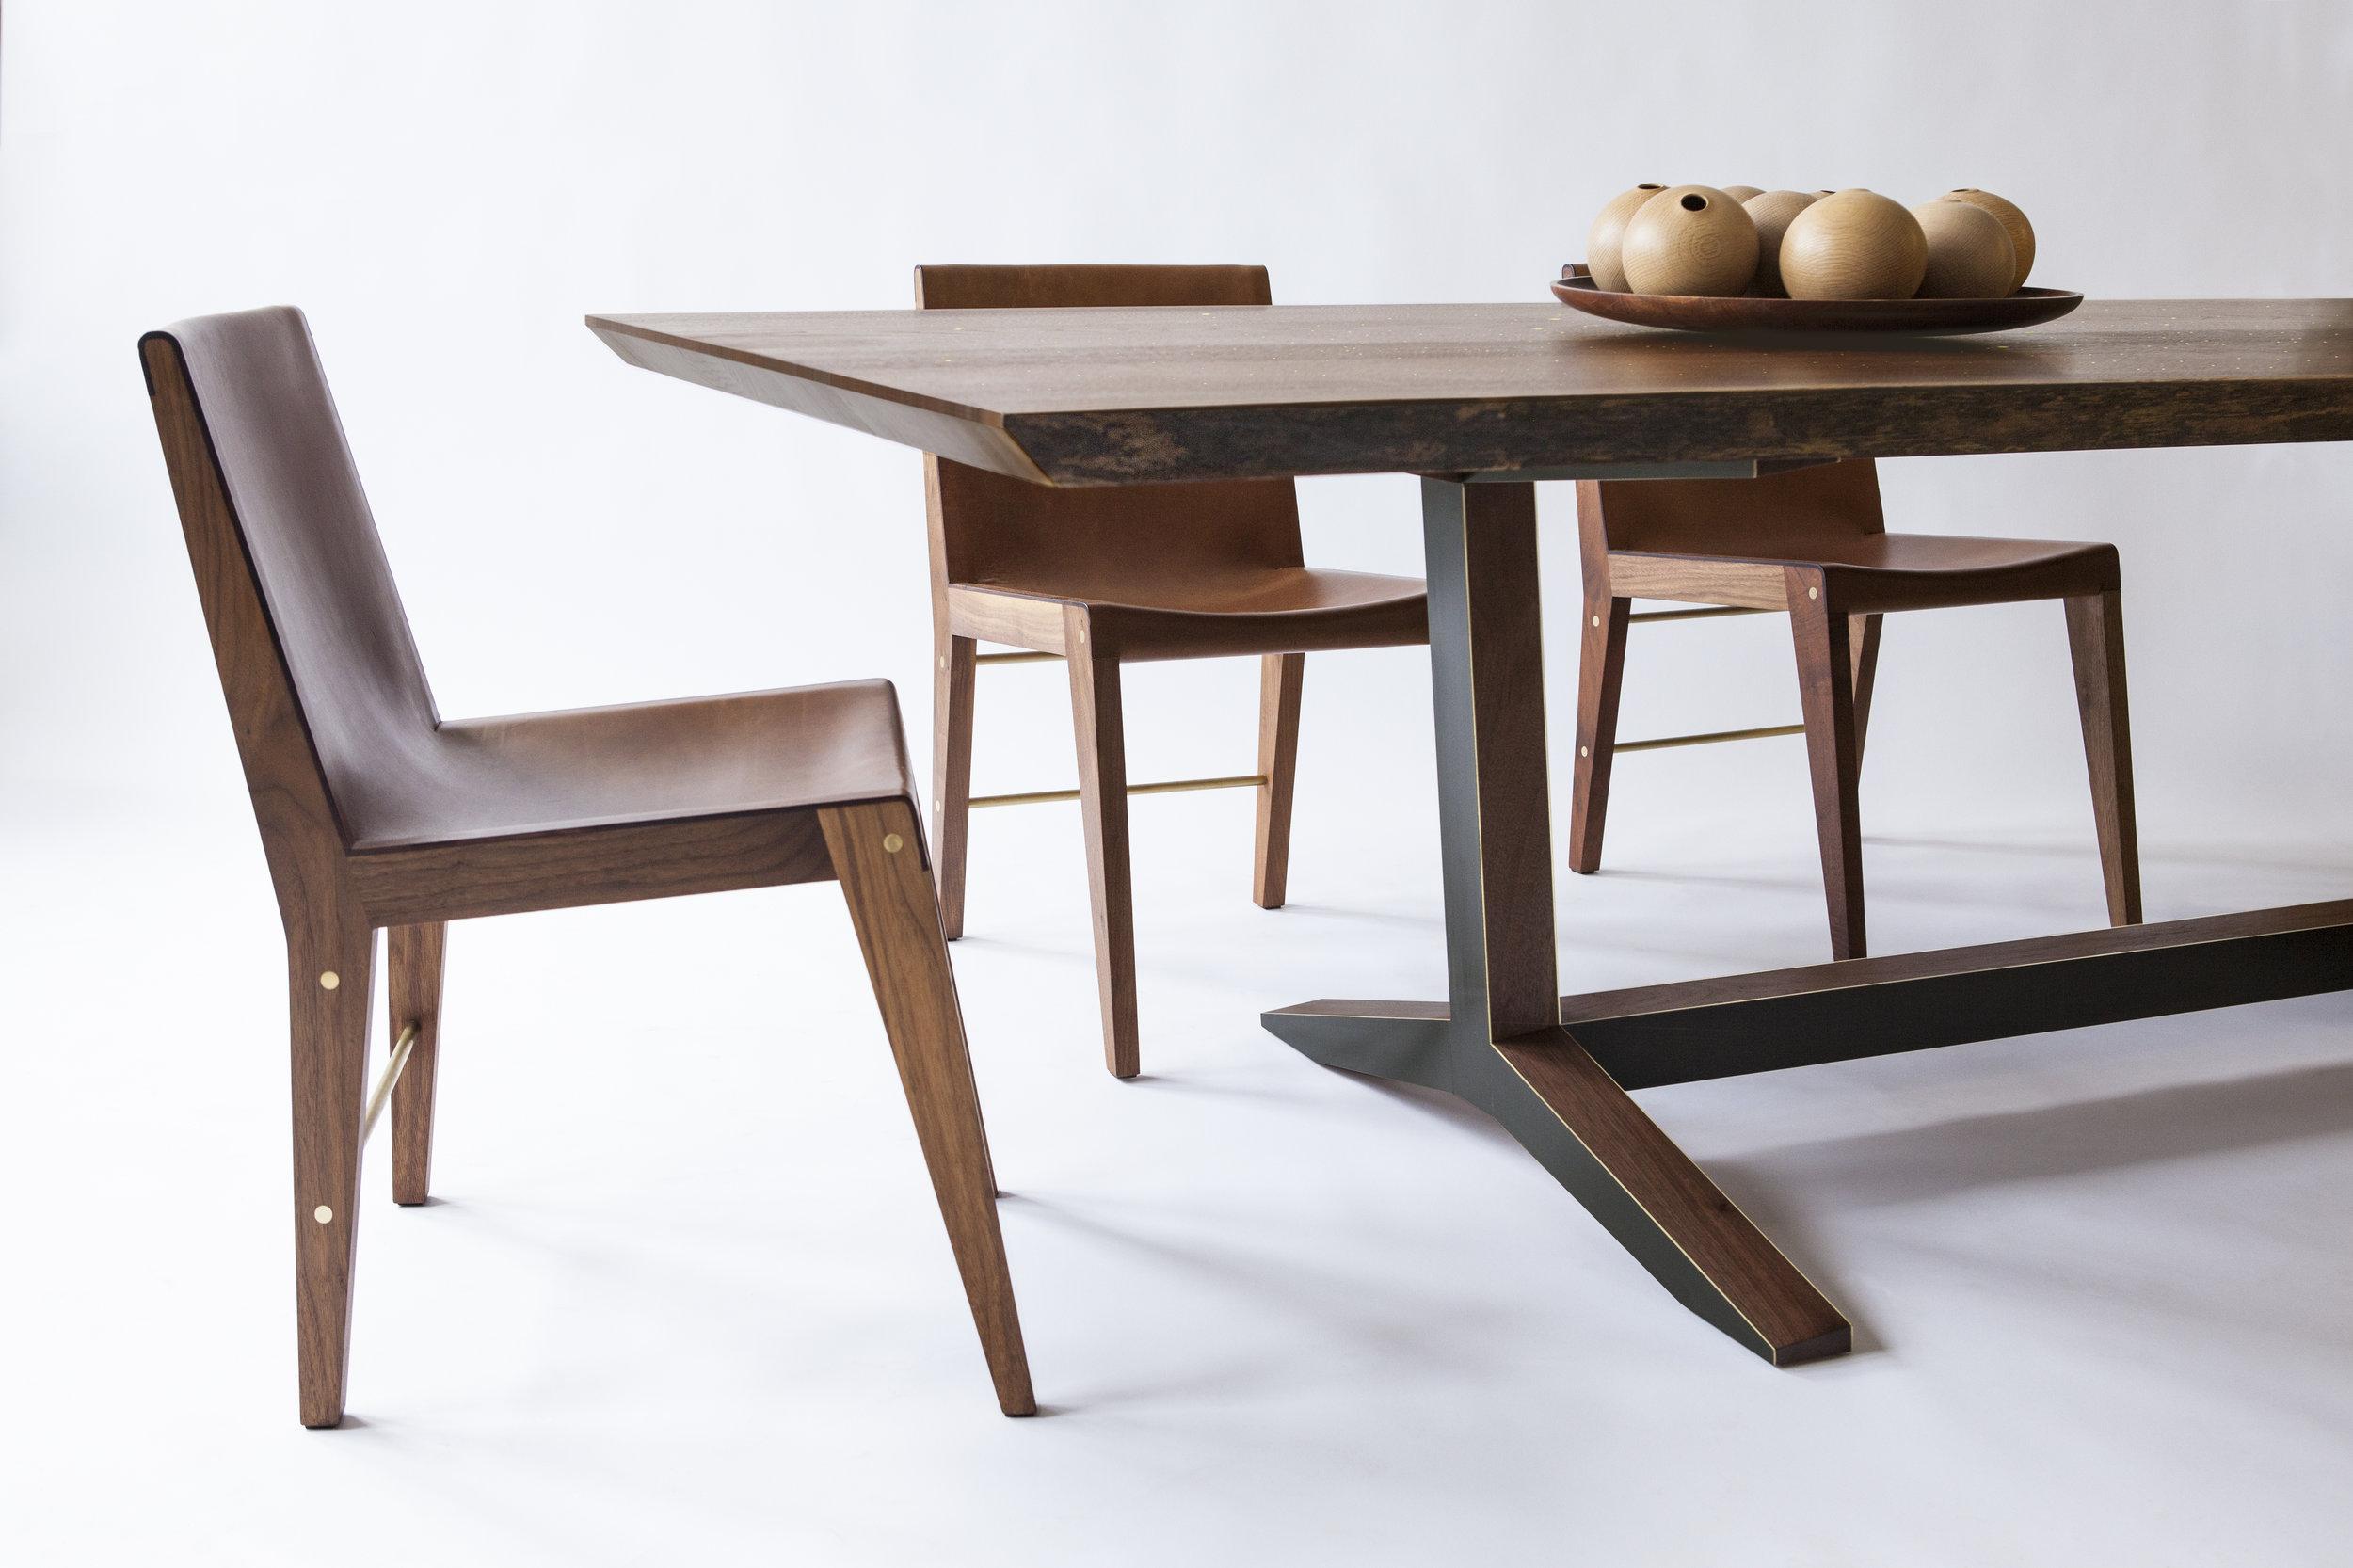 Asher Israelow Studio, fine furniture and architectural design Studio 4E (showroom) and woodshop, co-founder  asherisraelow.com @asherisraelowstudio